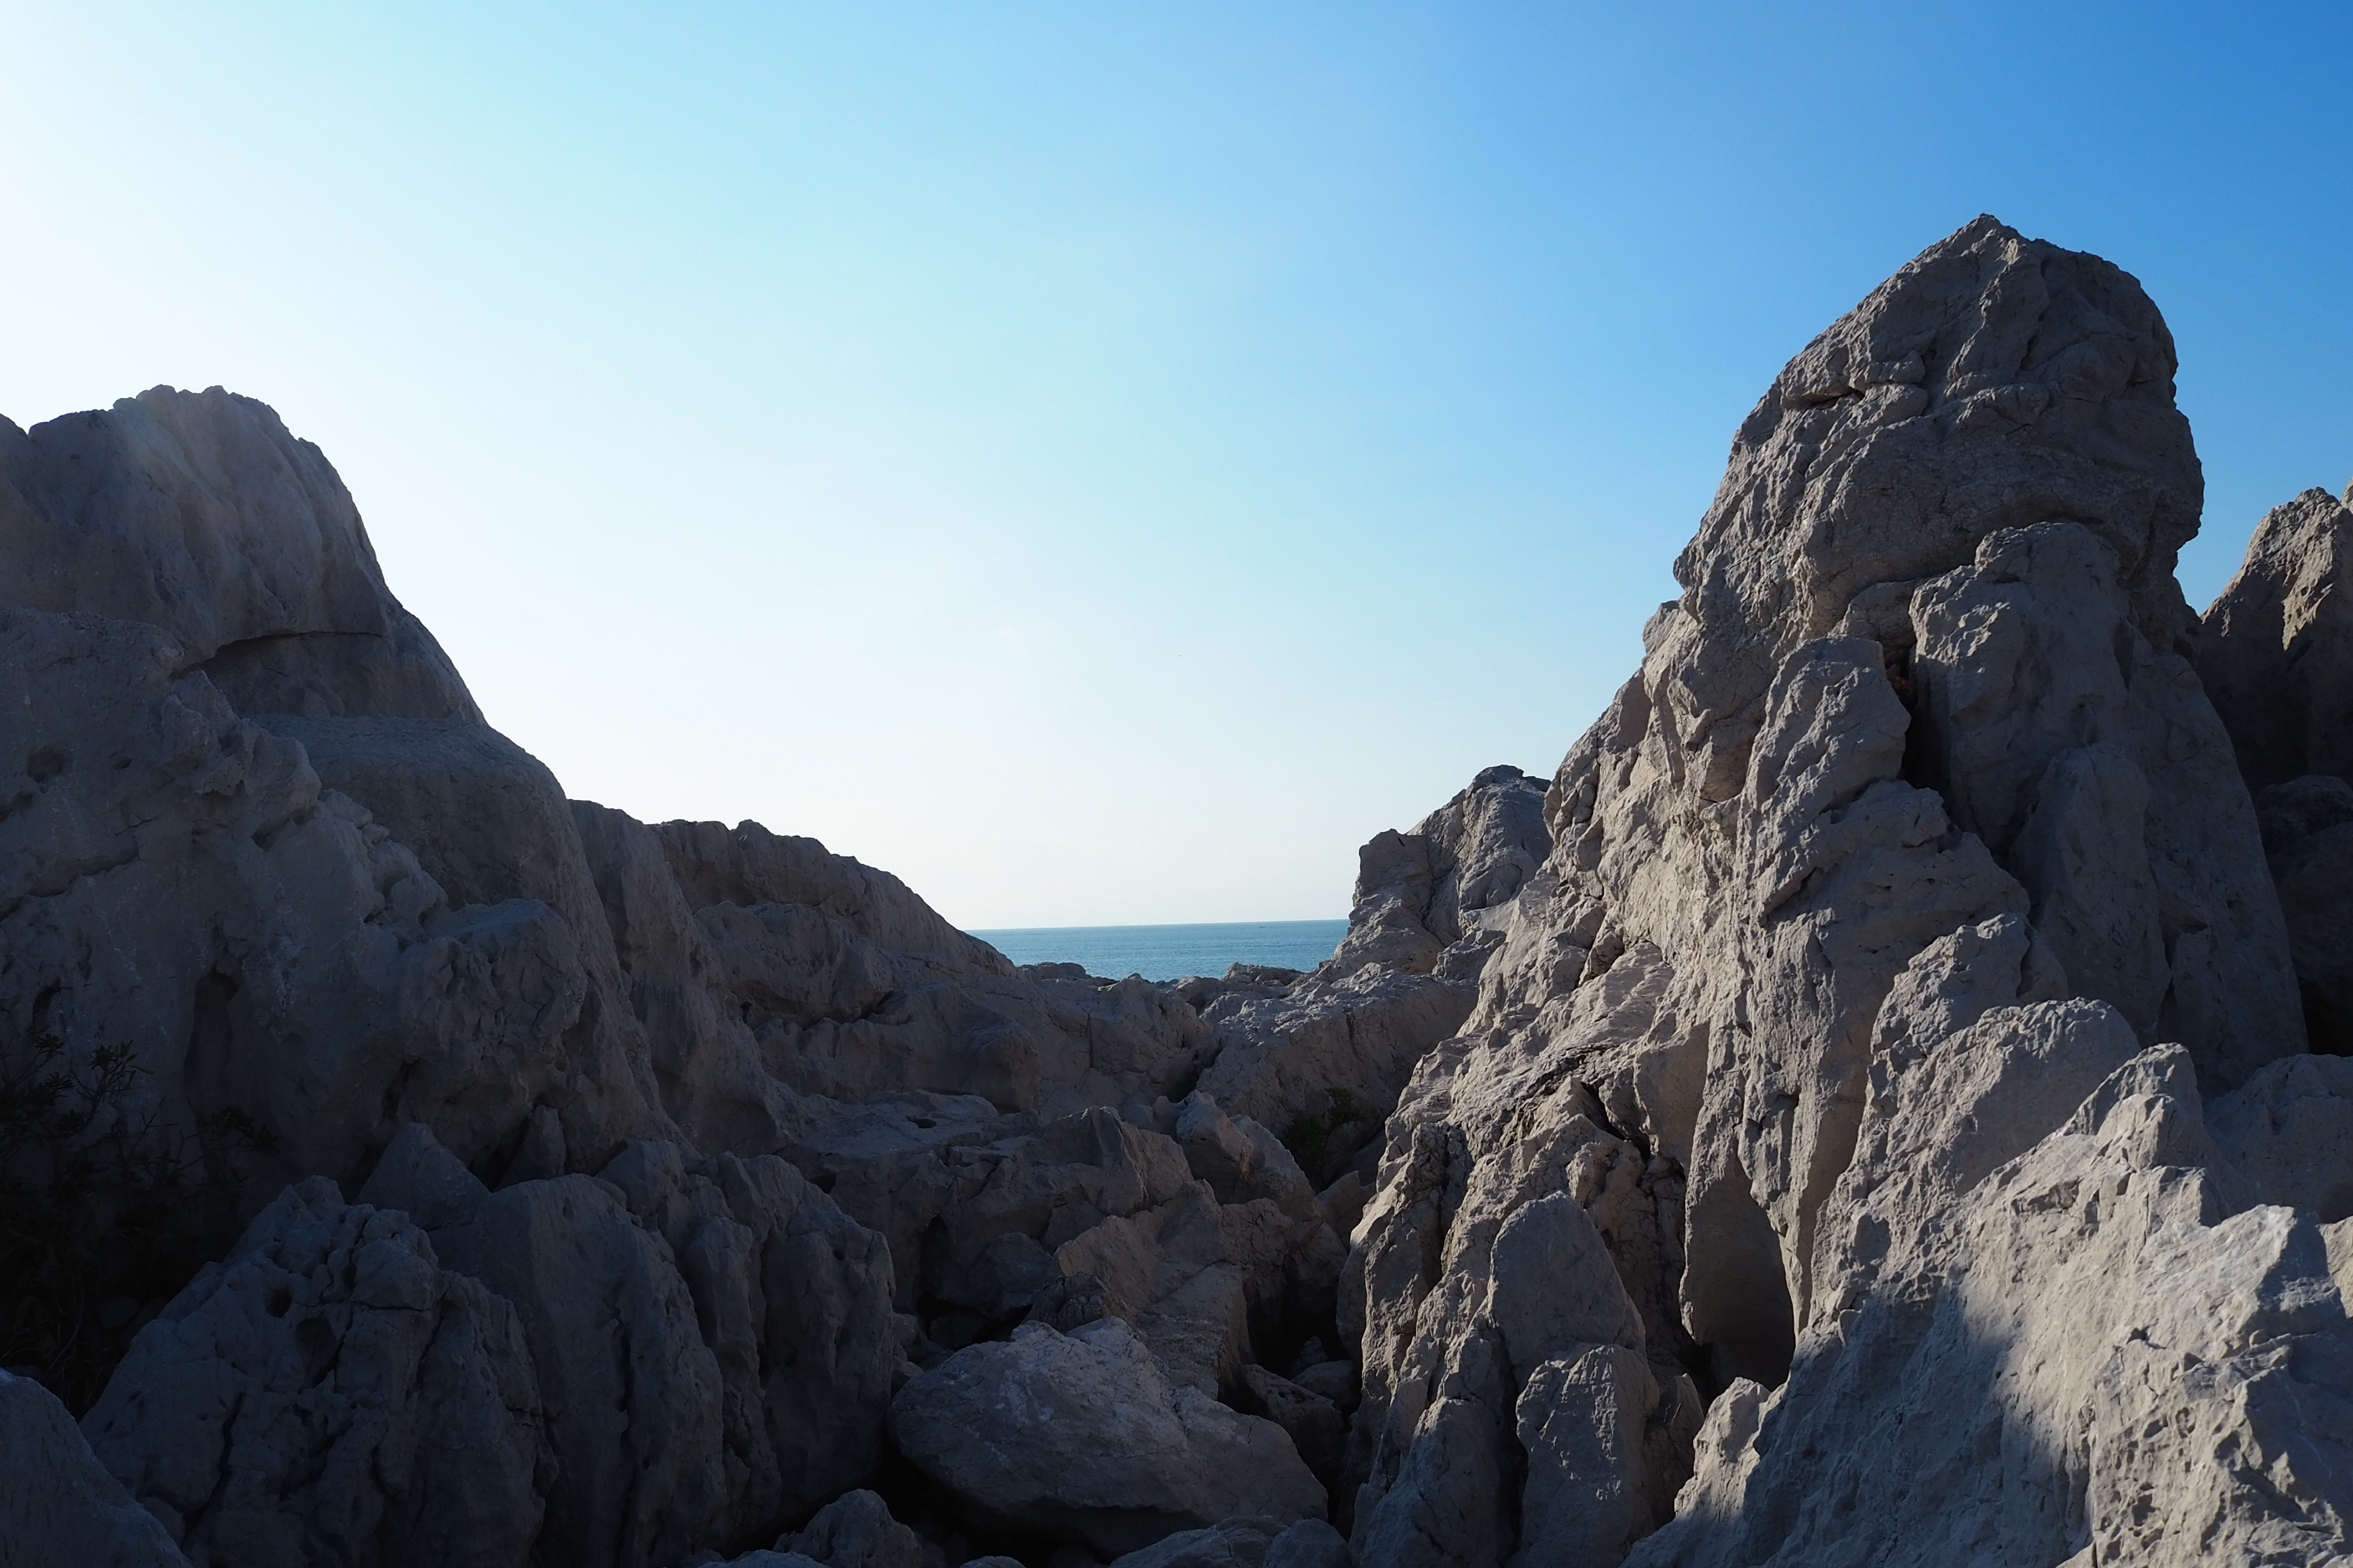 harleydavidson-motorcycle-touring-blog-wakayama-shirasakioceanpark-limestone-observatory.jpg